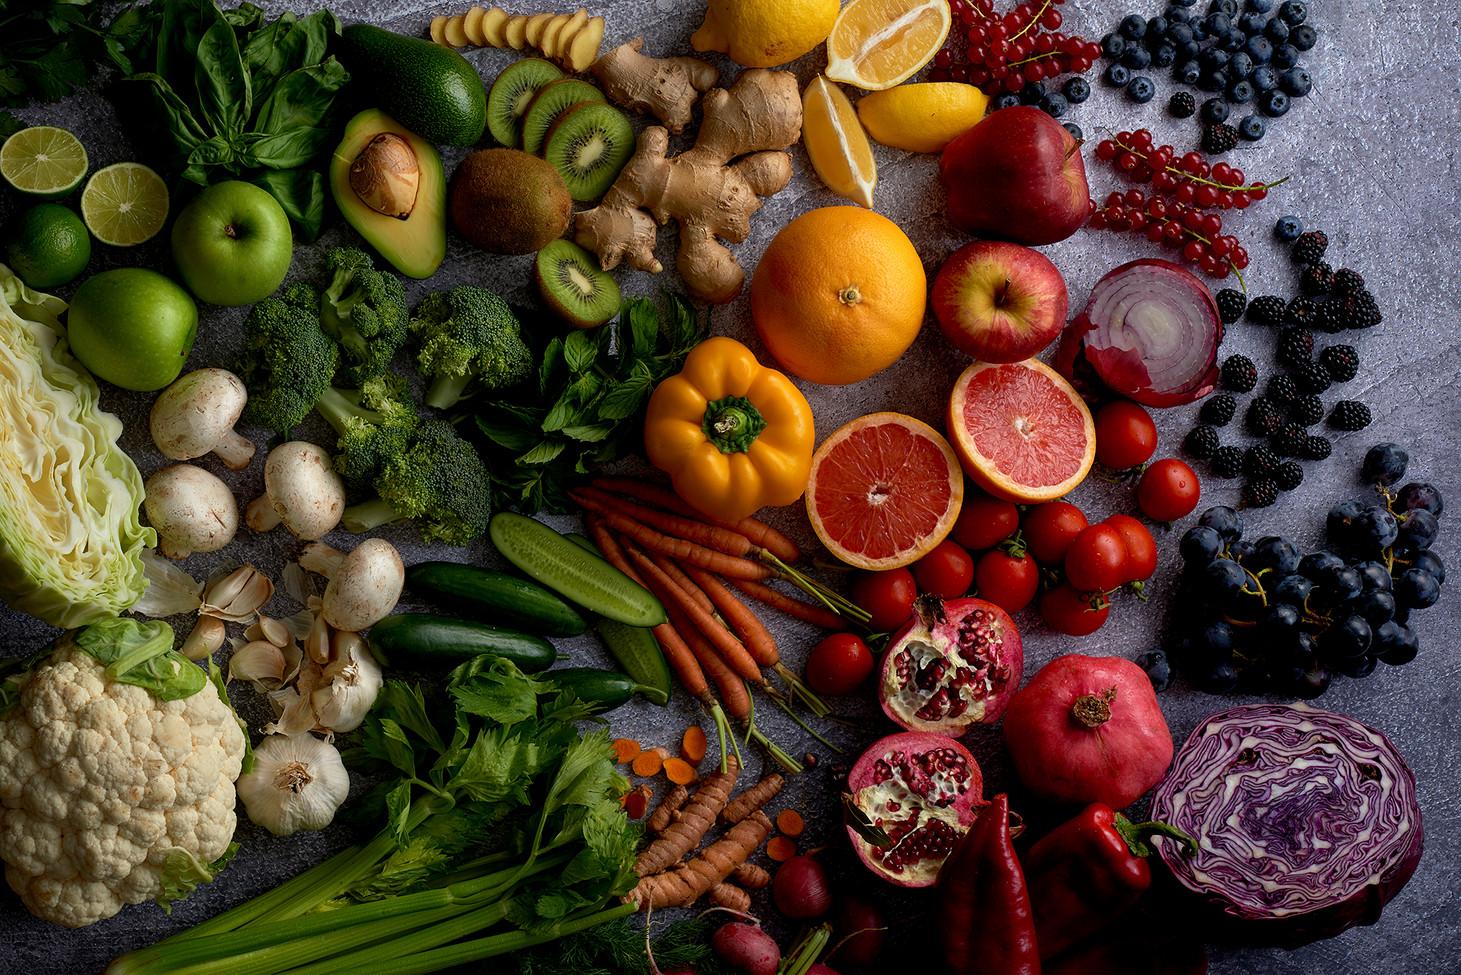 Veggies & Fruits